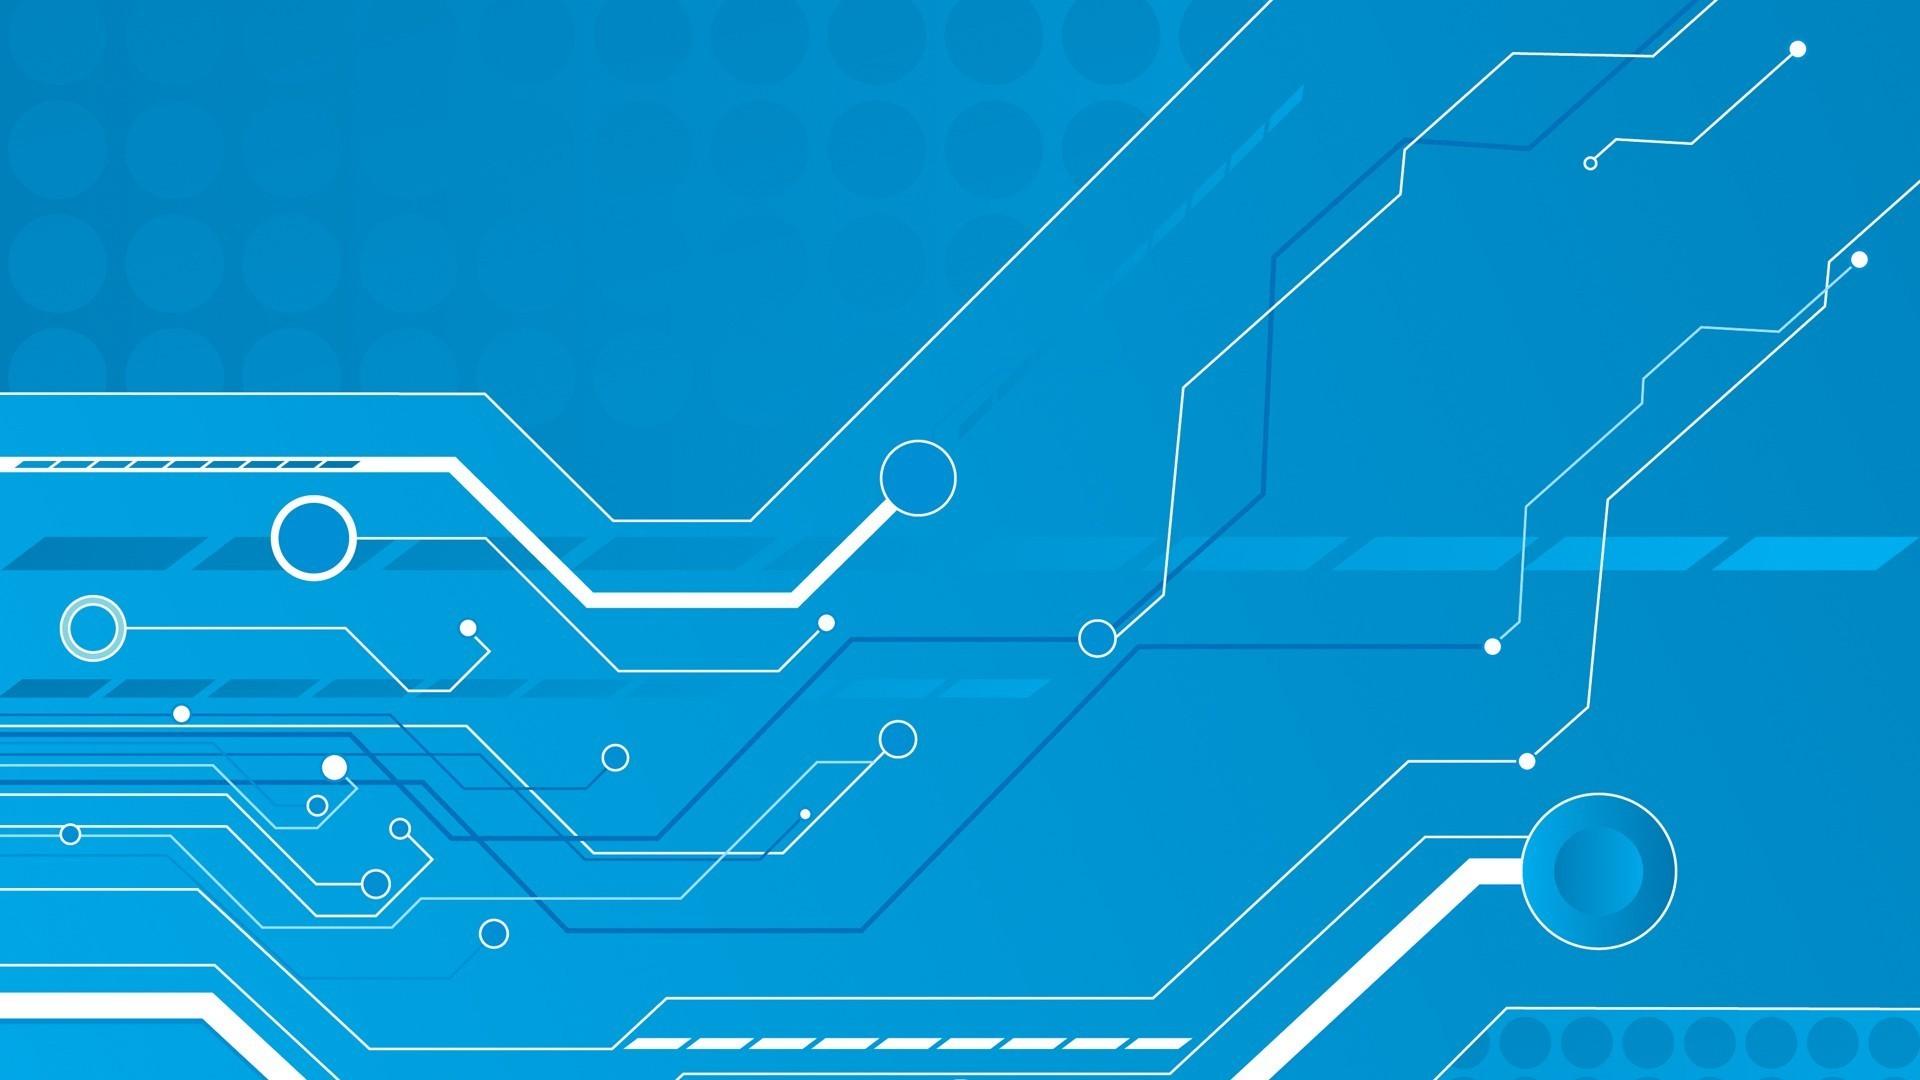 HD Desktop Technology Wallpaper Backgrounds For Download   Wallpapers 4k    Pinterest   Wallpaper and Wallpaper backgrounds